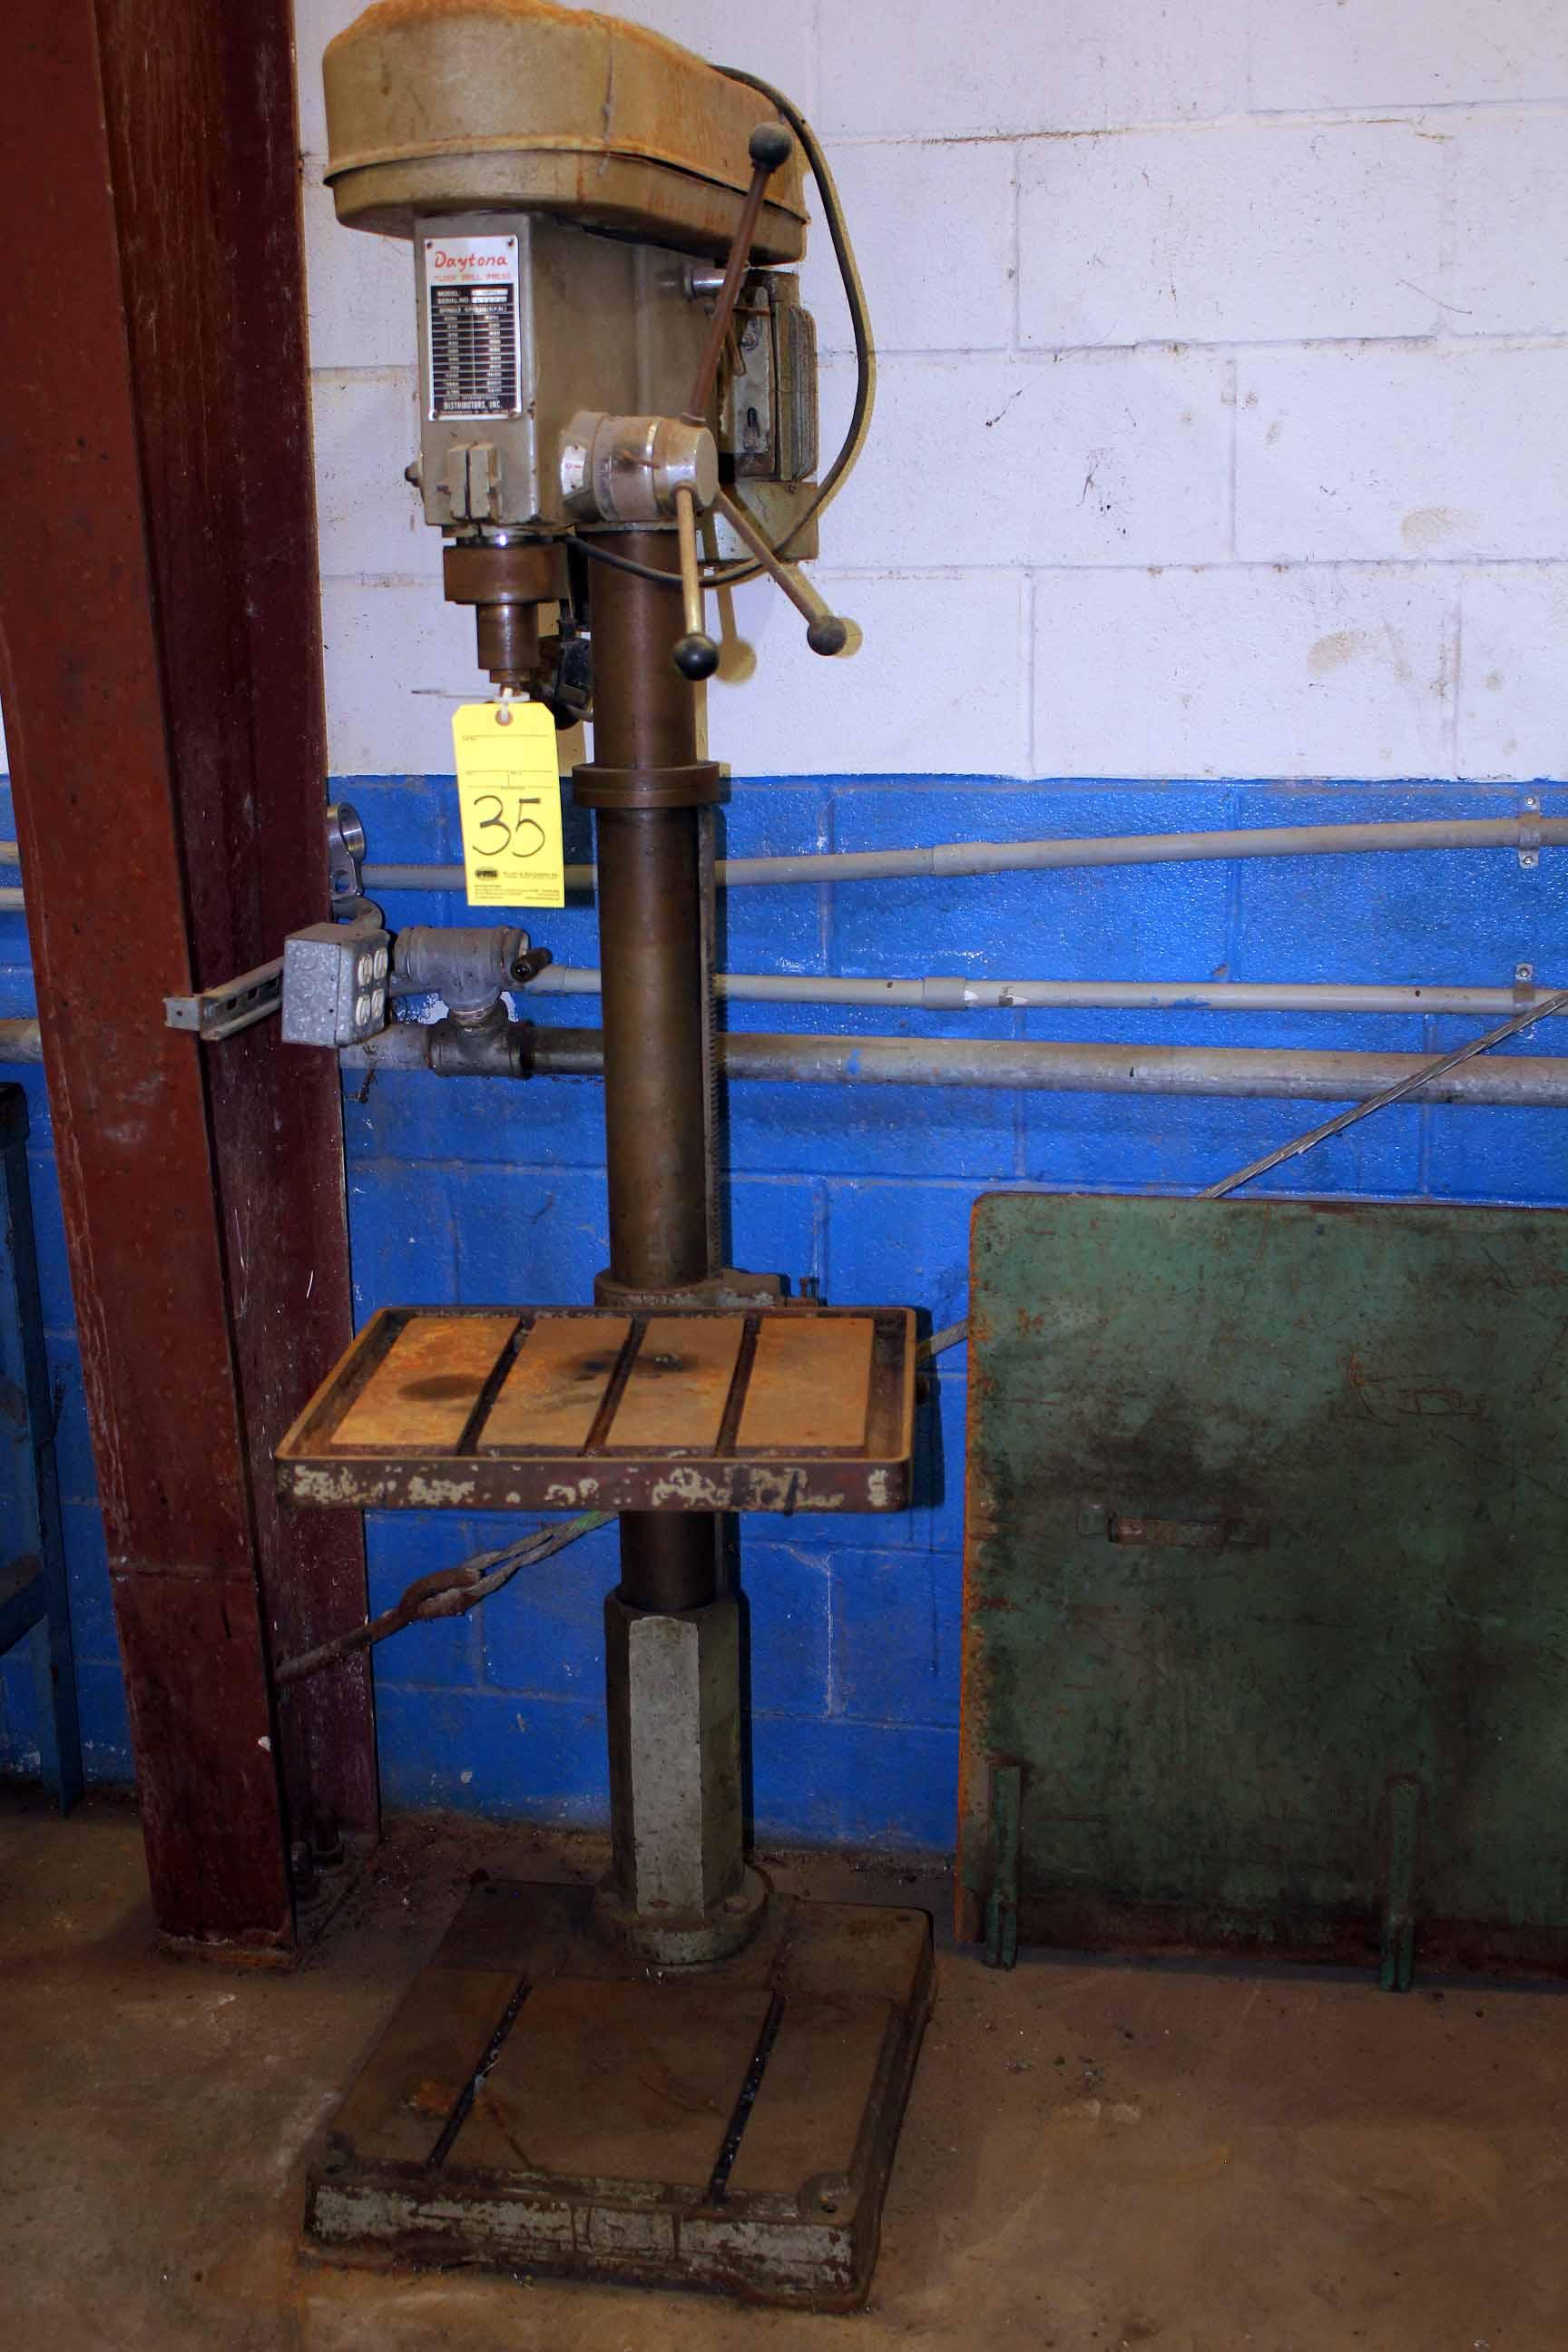 Lot 35 - FLOOR DRILL, DAYTONA MDL. 30MT4, S/N 07834